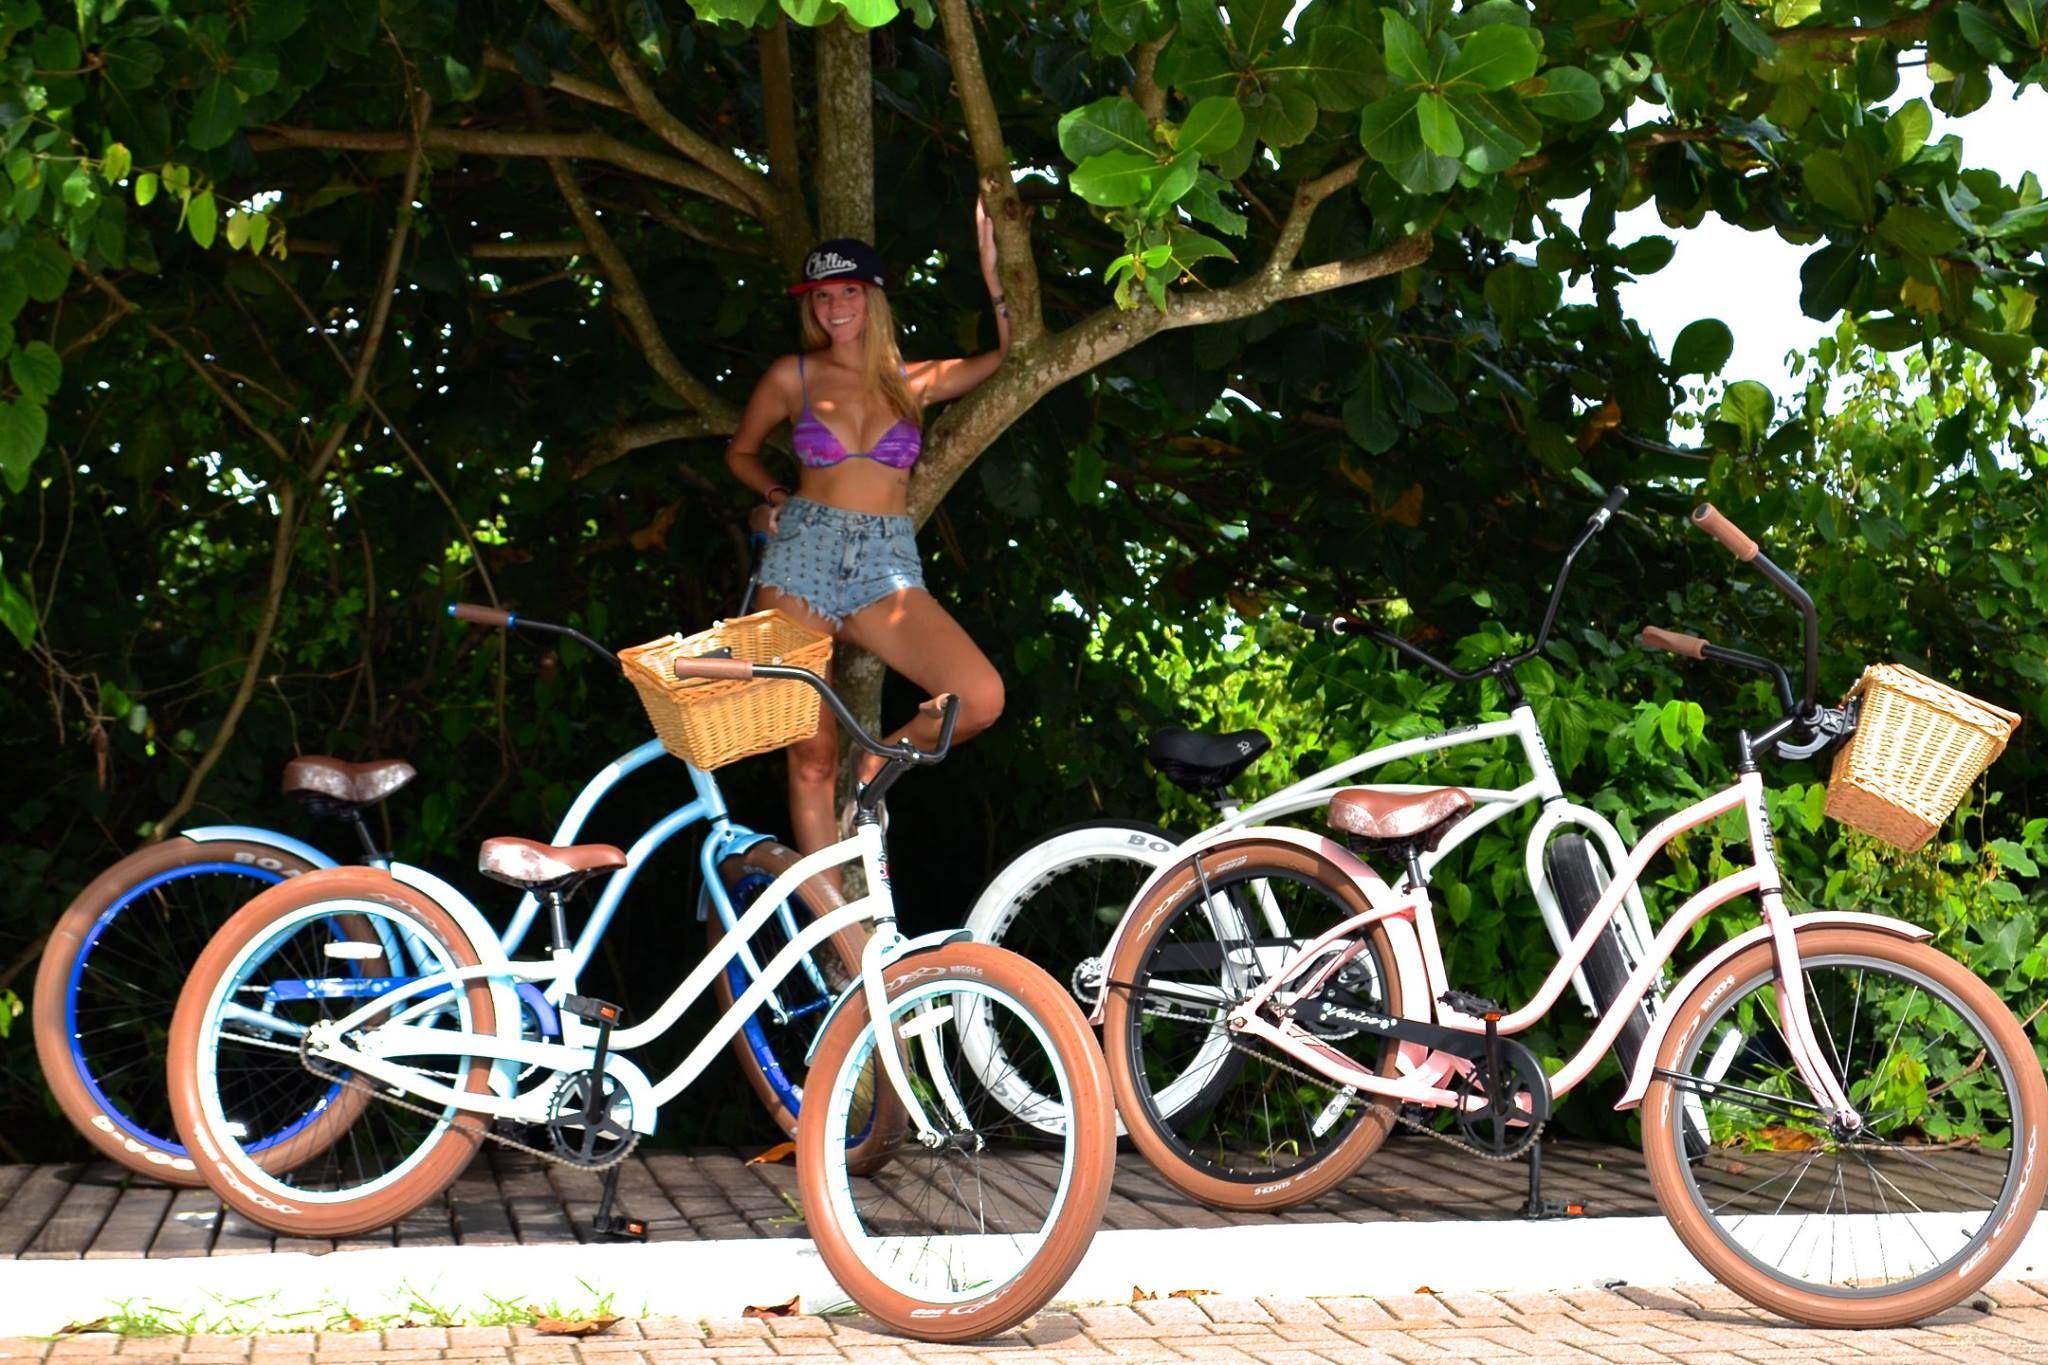 Bicycle Handmade Chrome 26-Inches Wide Wald Cruiser 3-Inch Rise Steel Handlebar